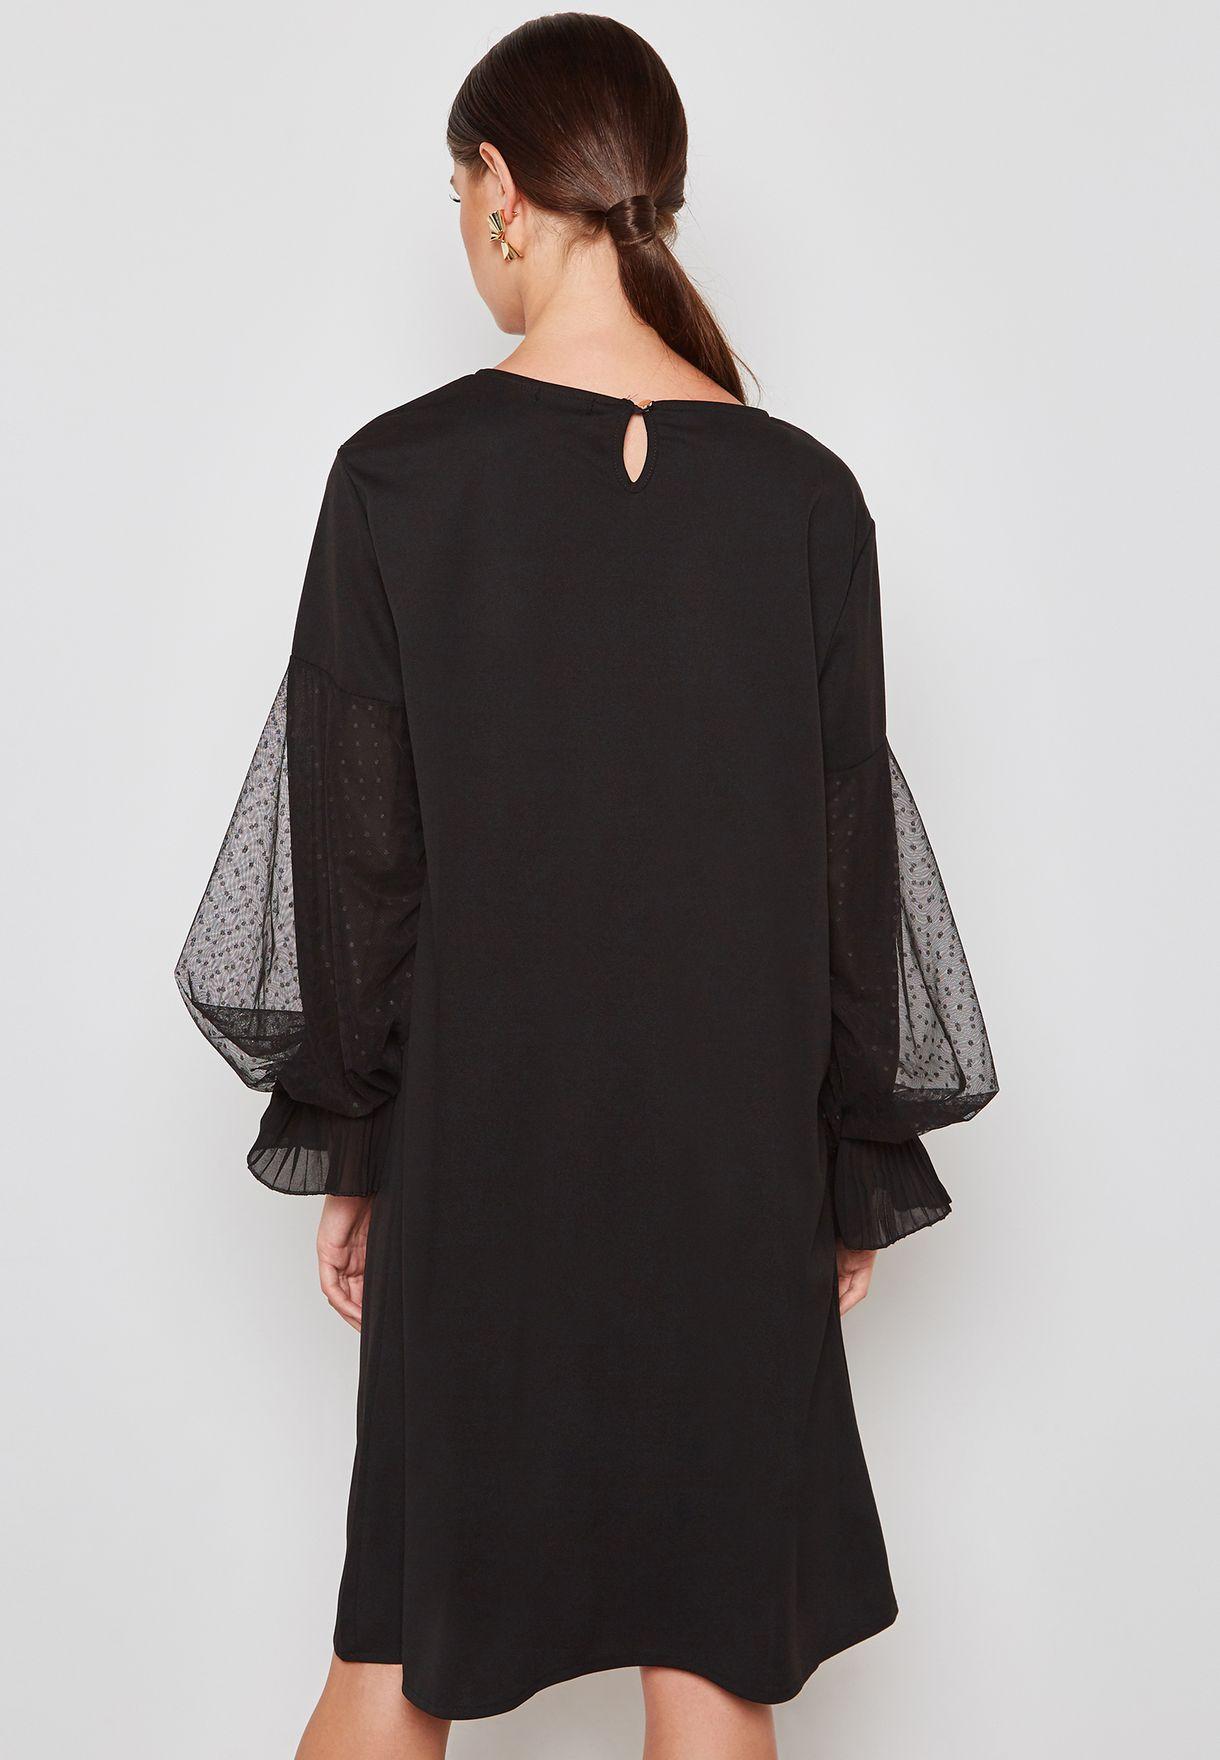 Dotted Lace Puffed Sleeve Midi Dress